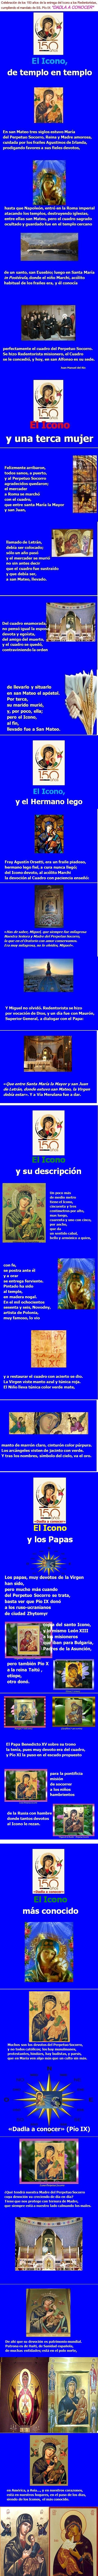 20150610163351-cartelon-icono.jpg